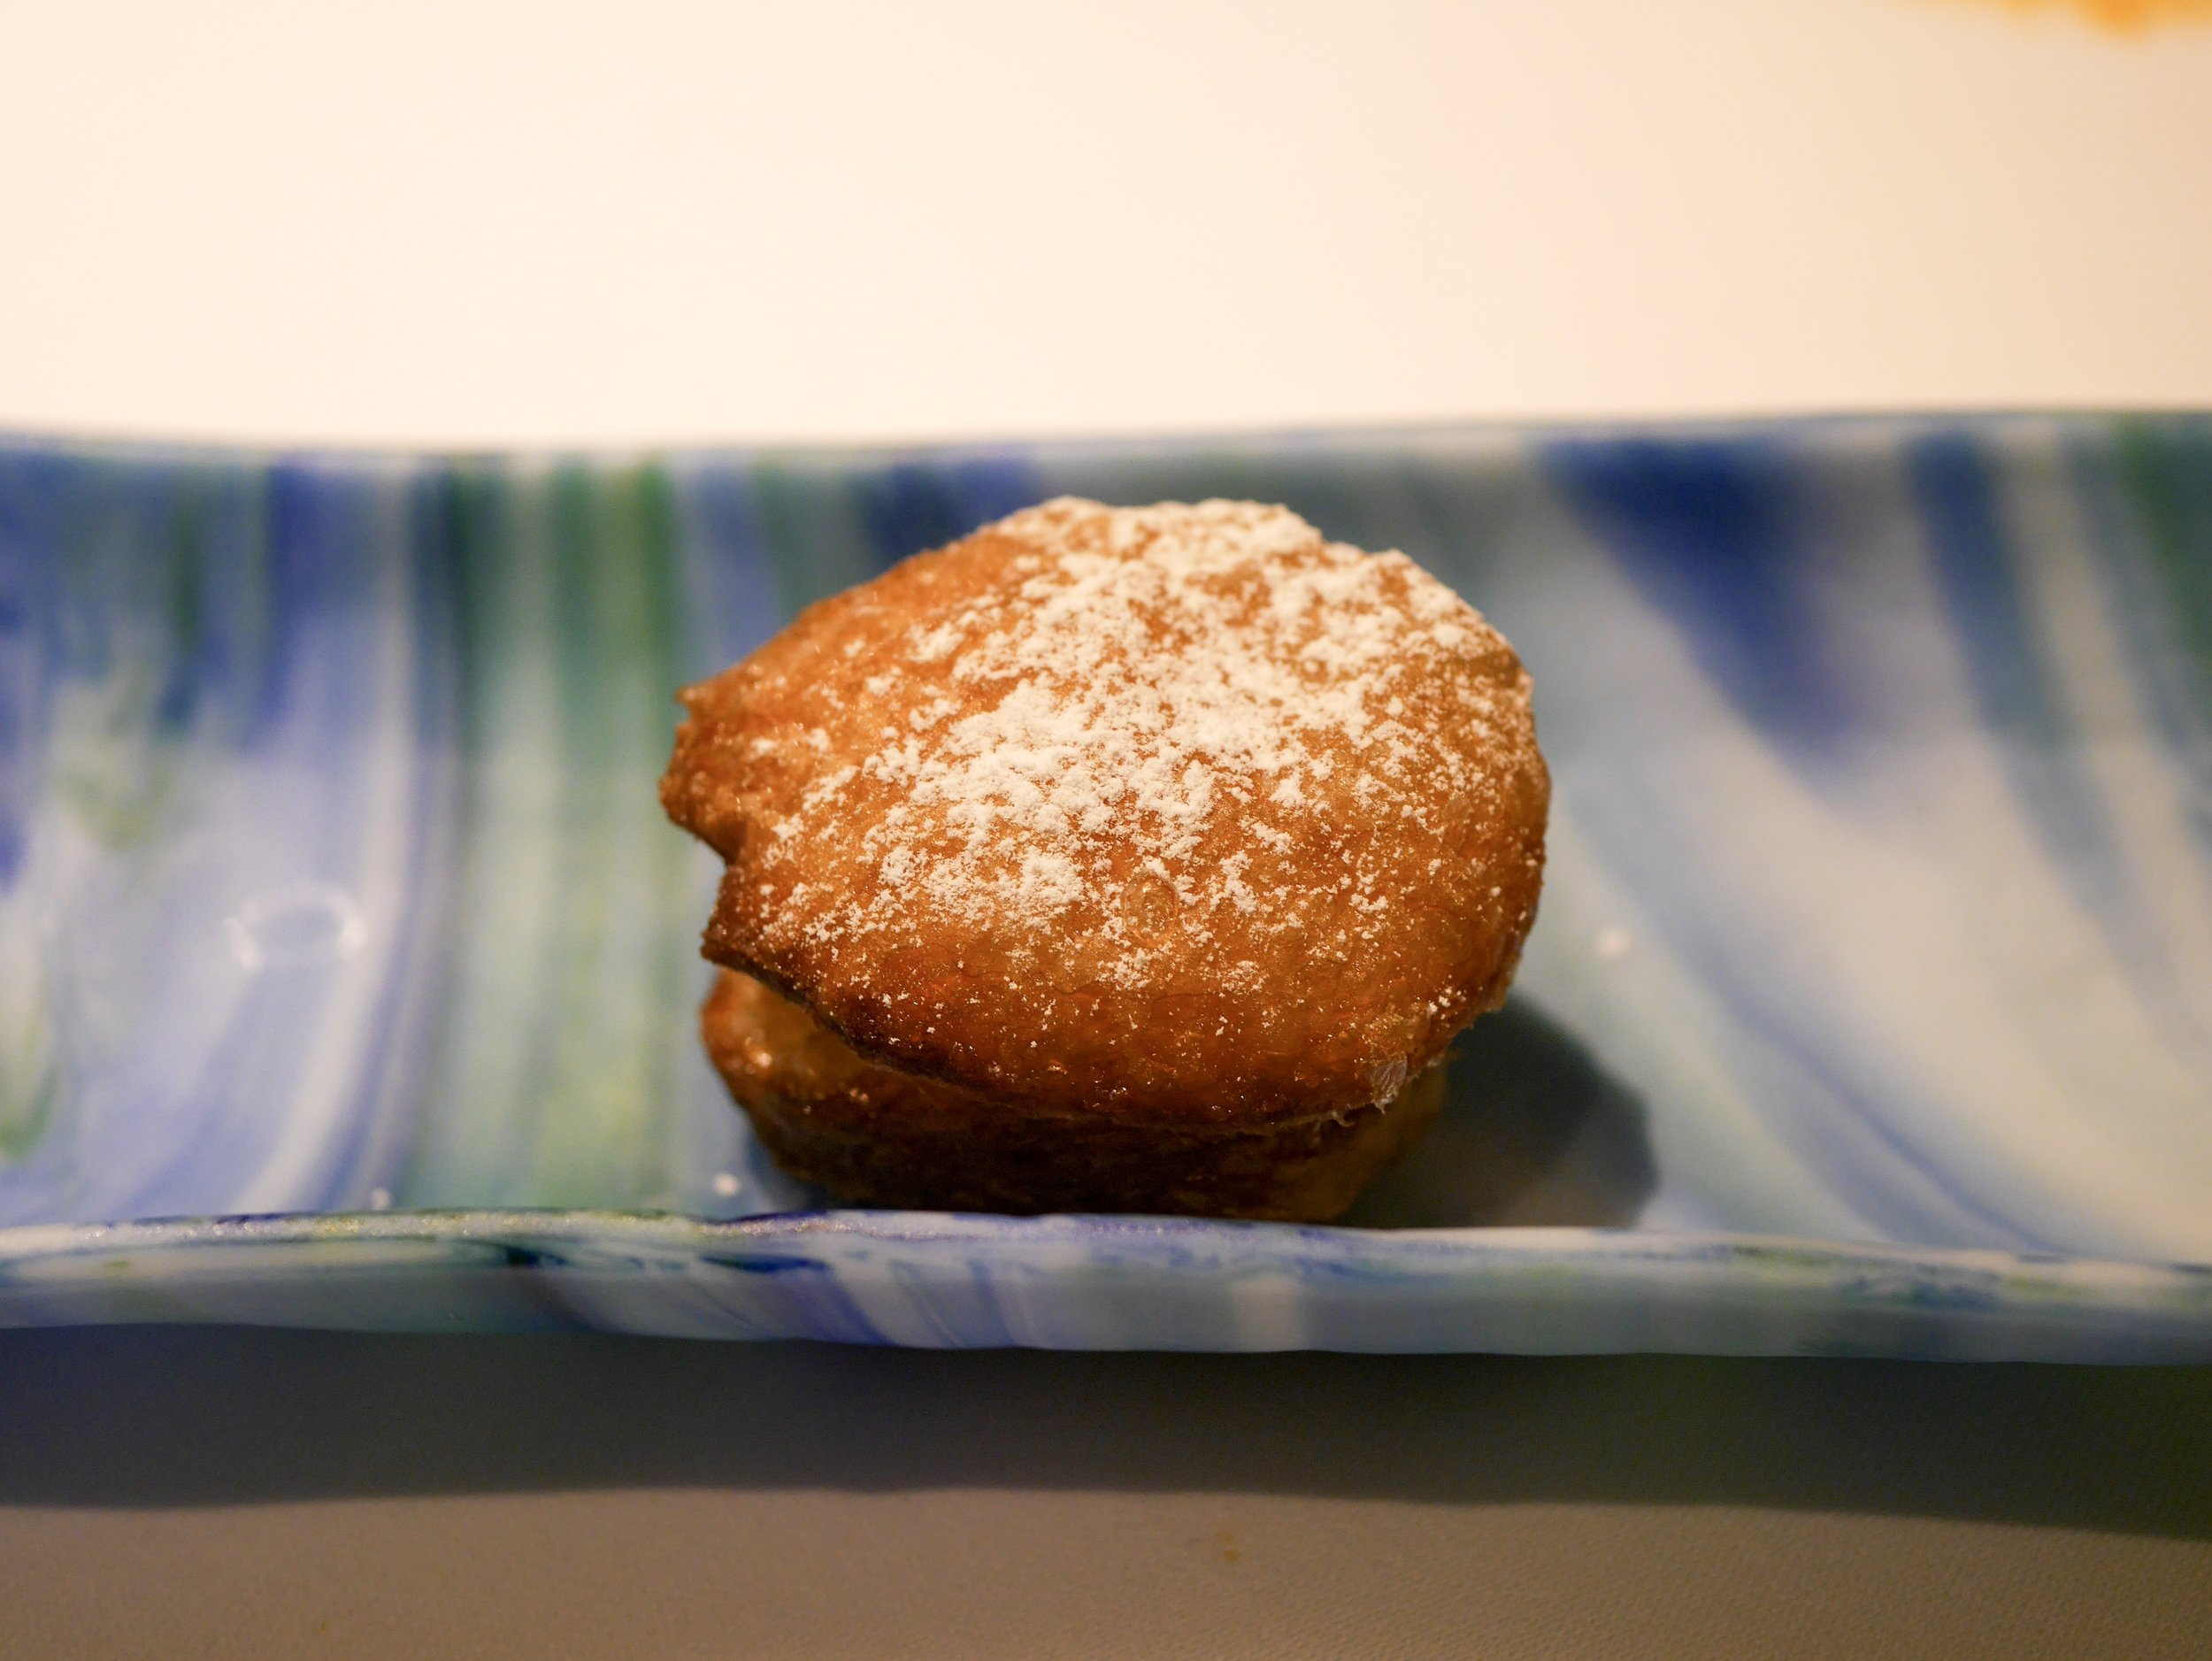 Cronut stuffed with kheer